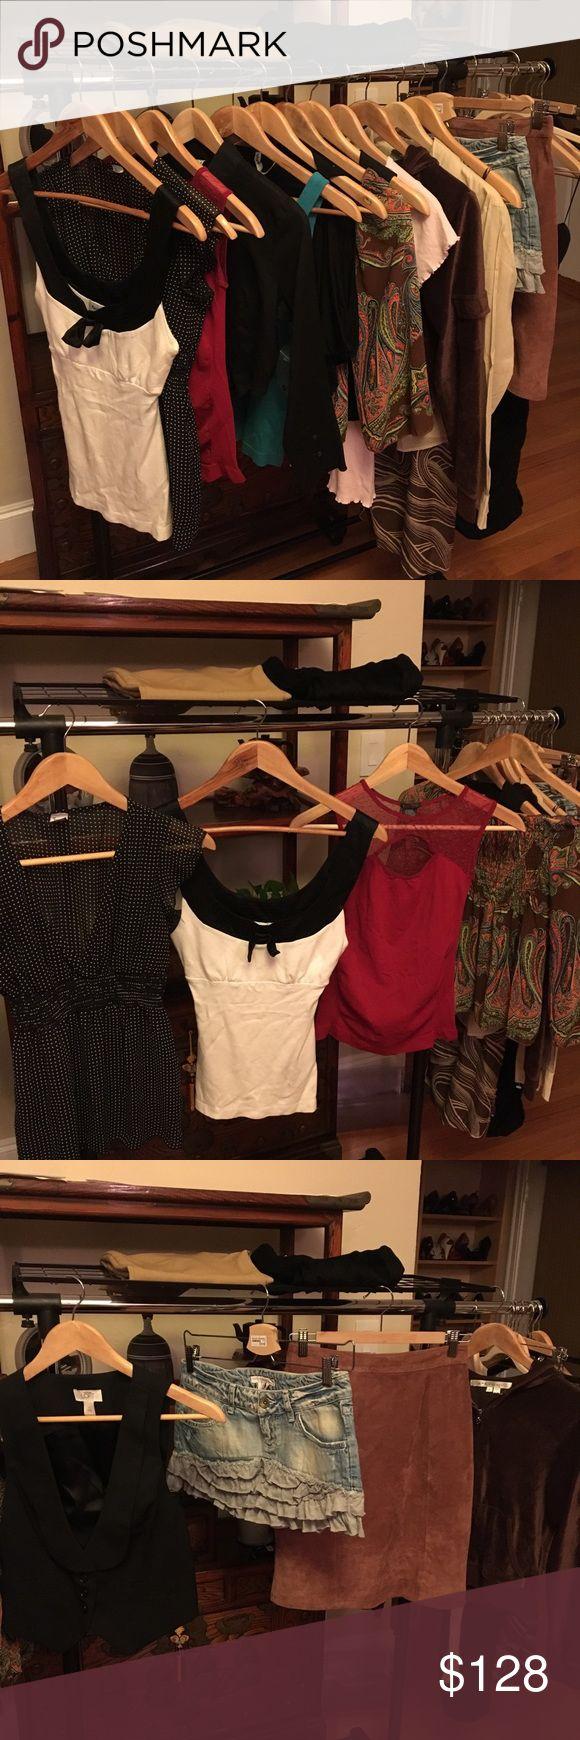 17 pc Resale Bundle lot Armani bebe top skirts XS Banana Republic button blouse, S; Armani Collezioni Capri pants, semi bell hem, runs like 0;  NWOT Xoxo pants, 1/2; Love 21 dress S/P; NWT Free People button blouse, 0; NWT Free People cowl neck top, S; Max Studio sweat jacket, S; GIII leather skirt, 5/6; NWOT Bebe white/black top, XS; jeans skirt, 6; Express black tube dress, S; R Jeans floral top, S; Soho girls red top; NWOT Ann Taylor tuxedo vest, S; Twentieth Weenie ruffle blouse…